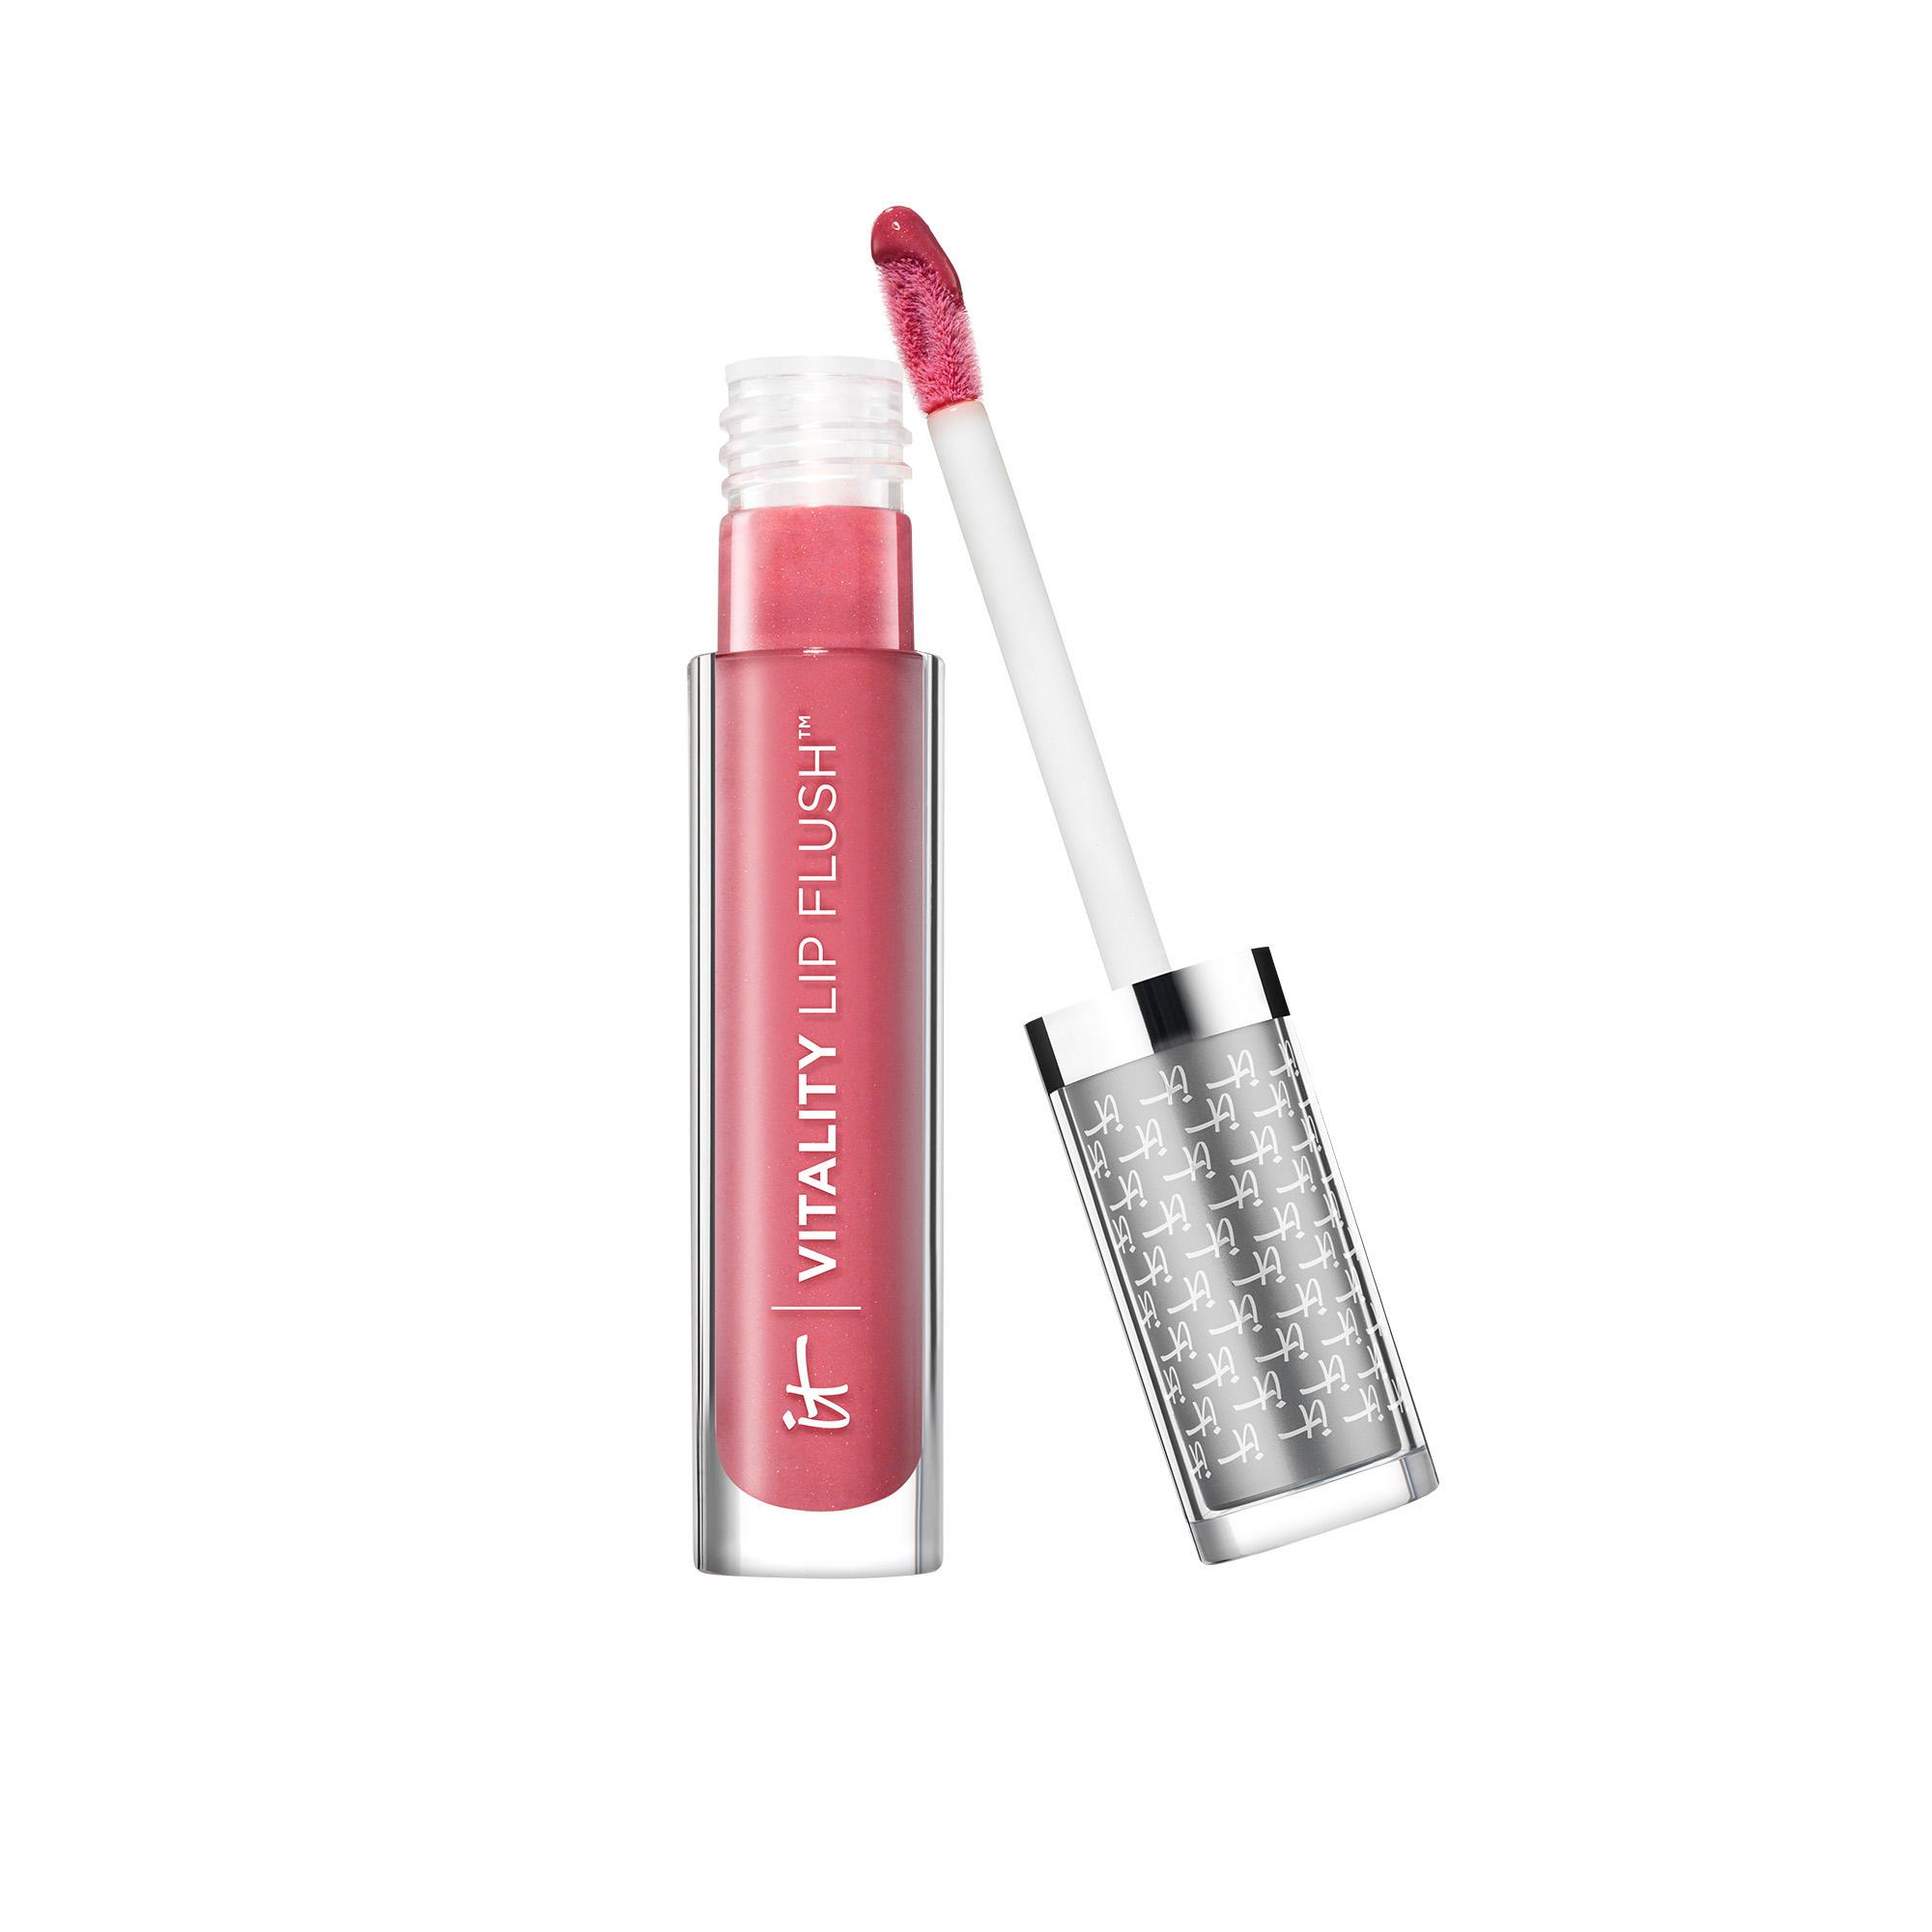 Vitality Lip Flush™ Butter Gloss